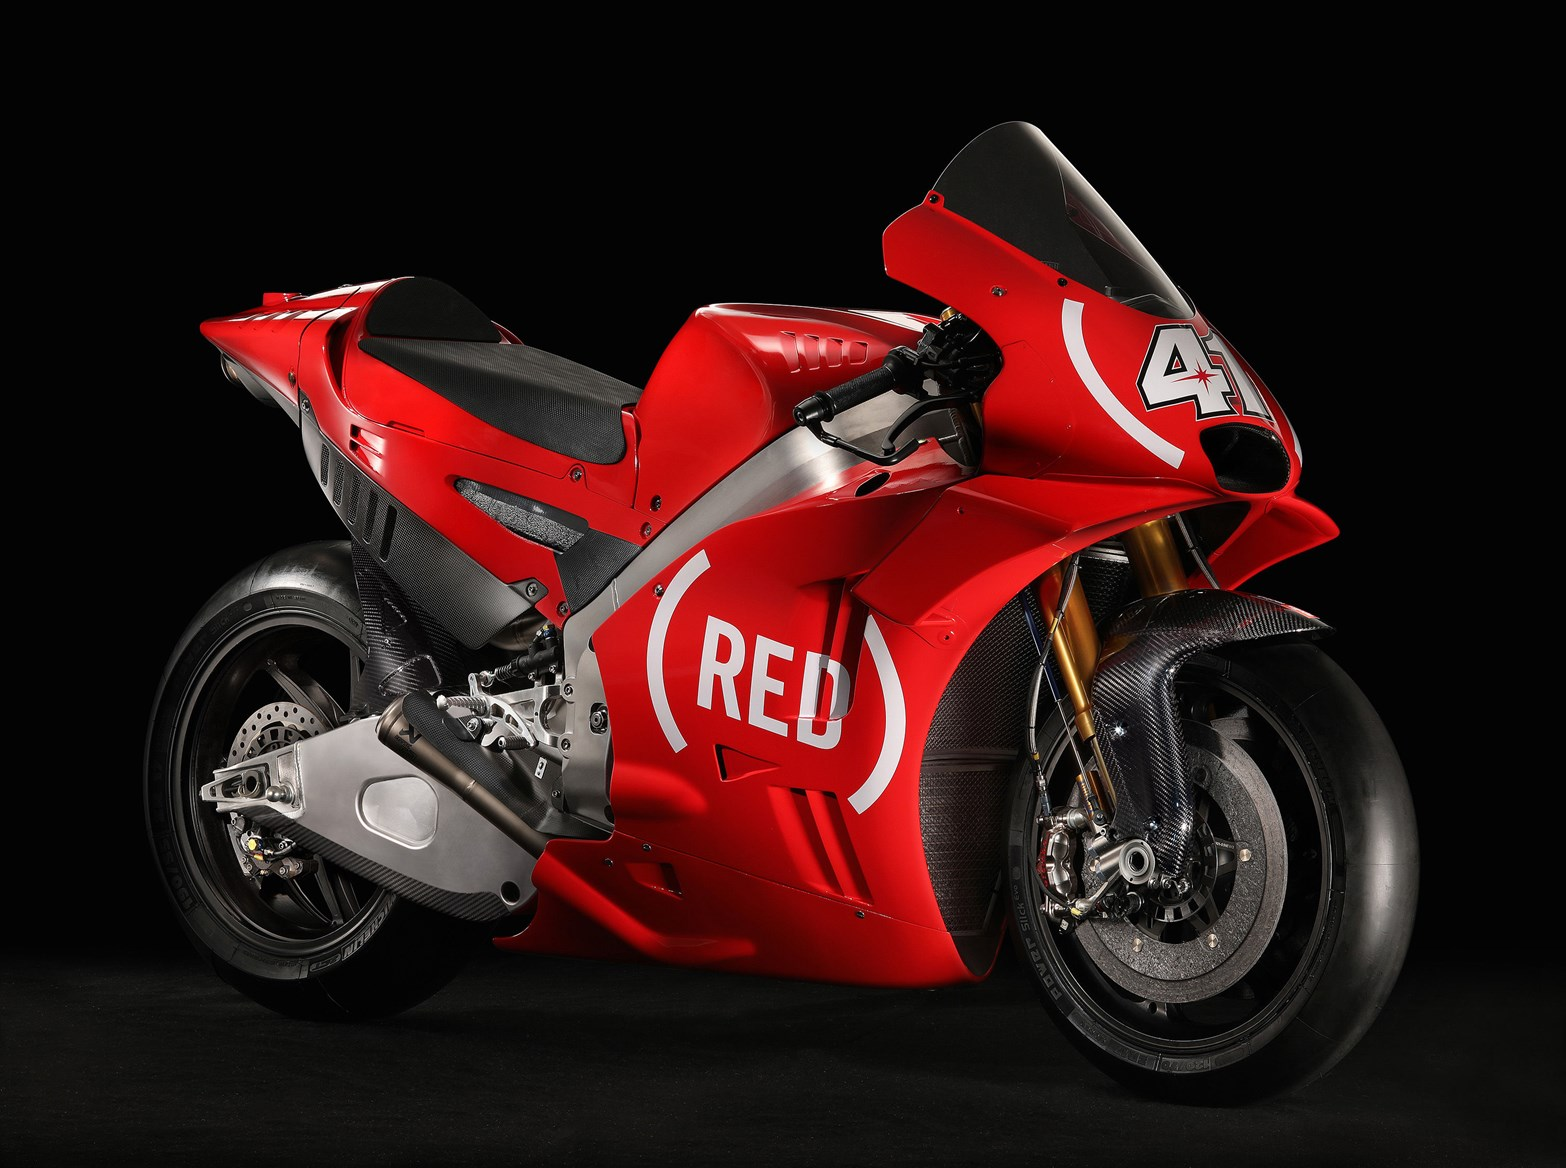 Index Of Wp Content Uploads 2017 11 All New Cbr 150r Racing Red Kota Semarang 001